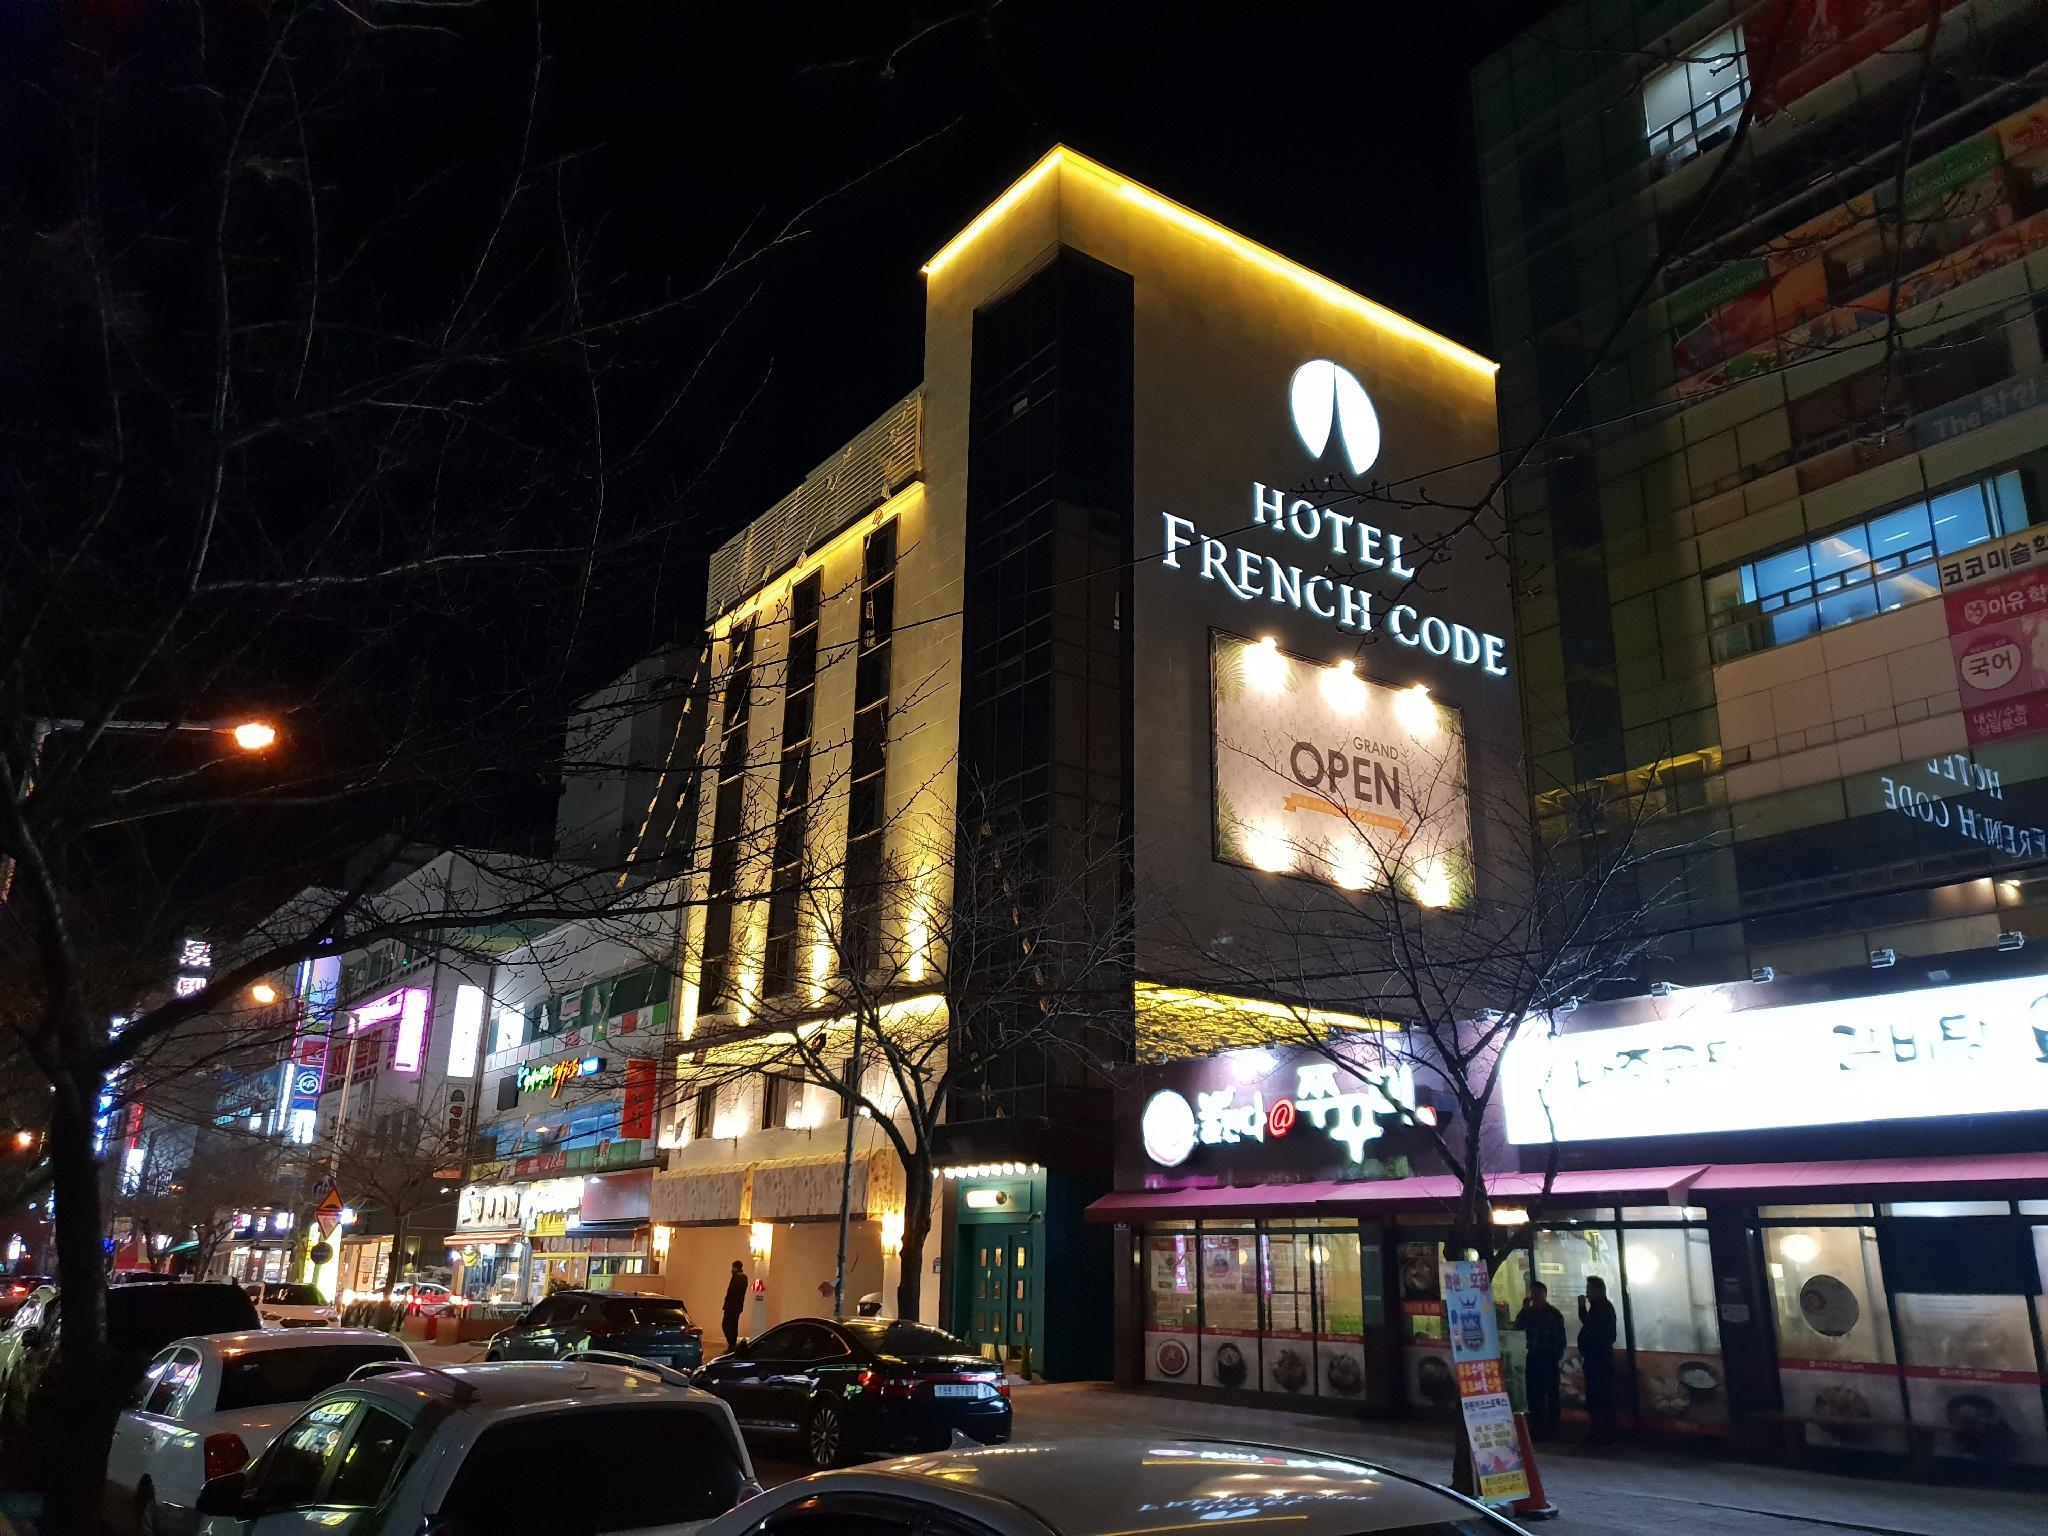 FrenchCode Hotel